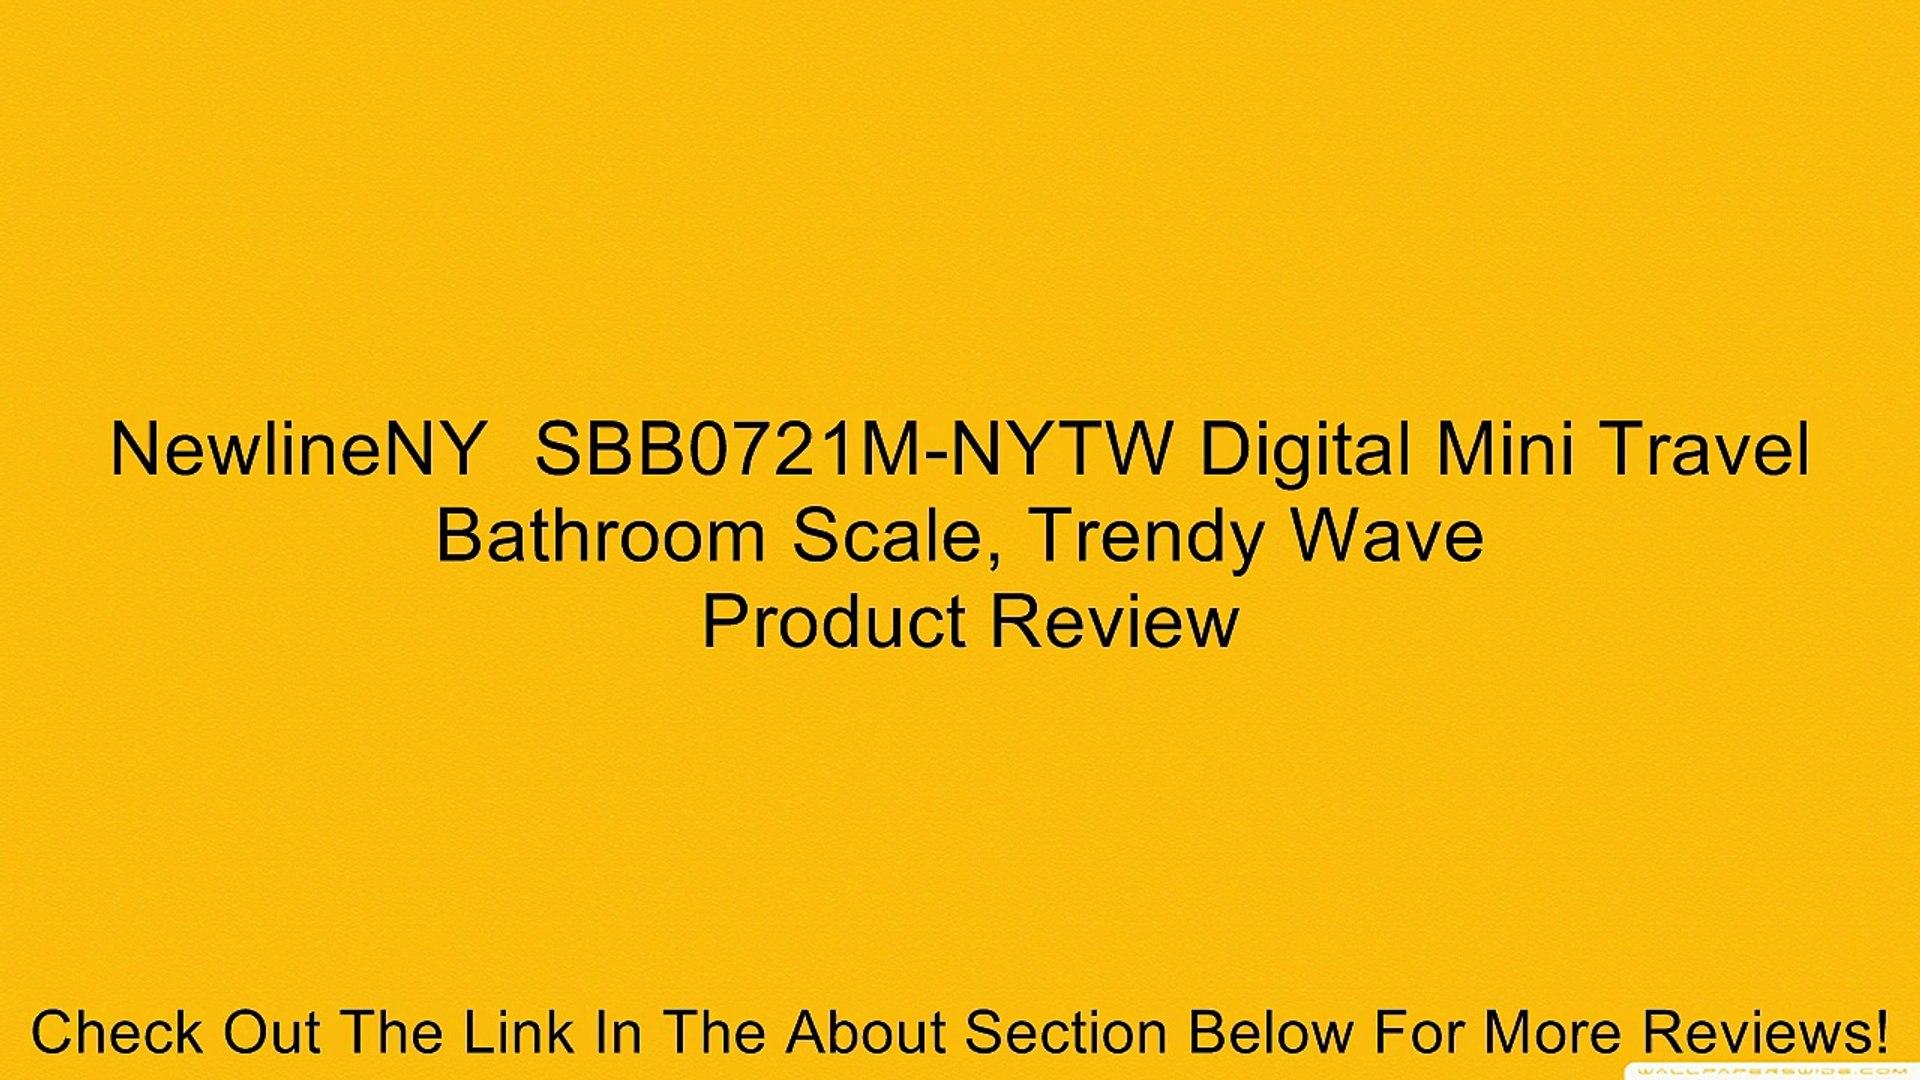 Nytw Digital Mini Travel Bathroom Scale